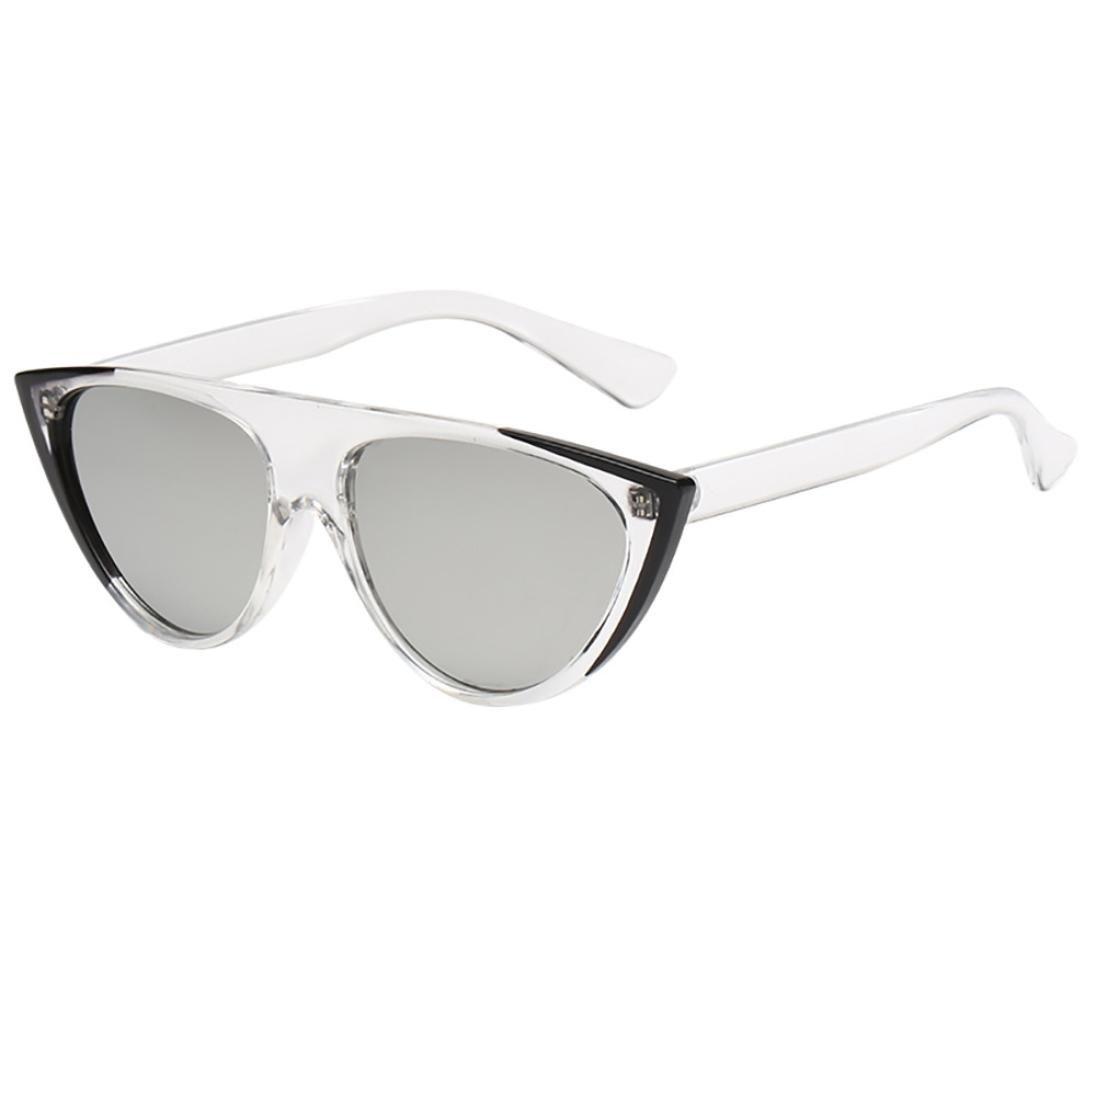 WILLTOO Unisex Sunglasses Vintage Cat Eye Glasses Fashion UV Protection Eyewear Rapper (H)